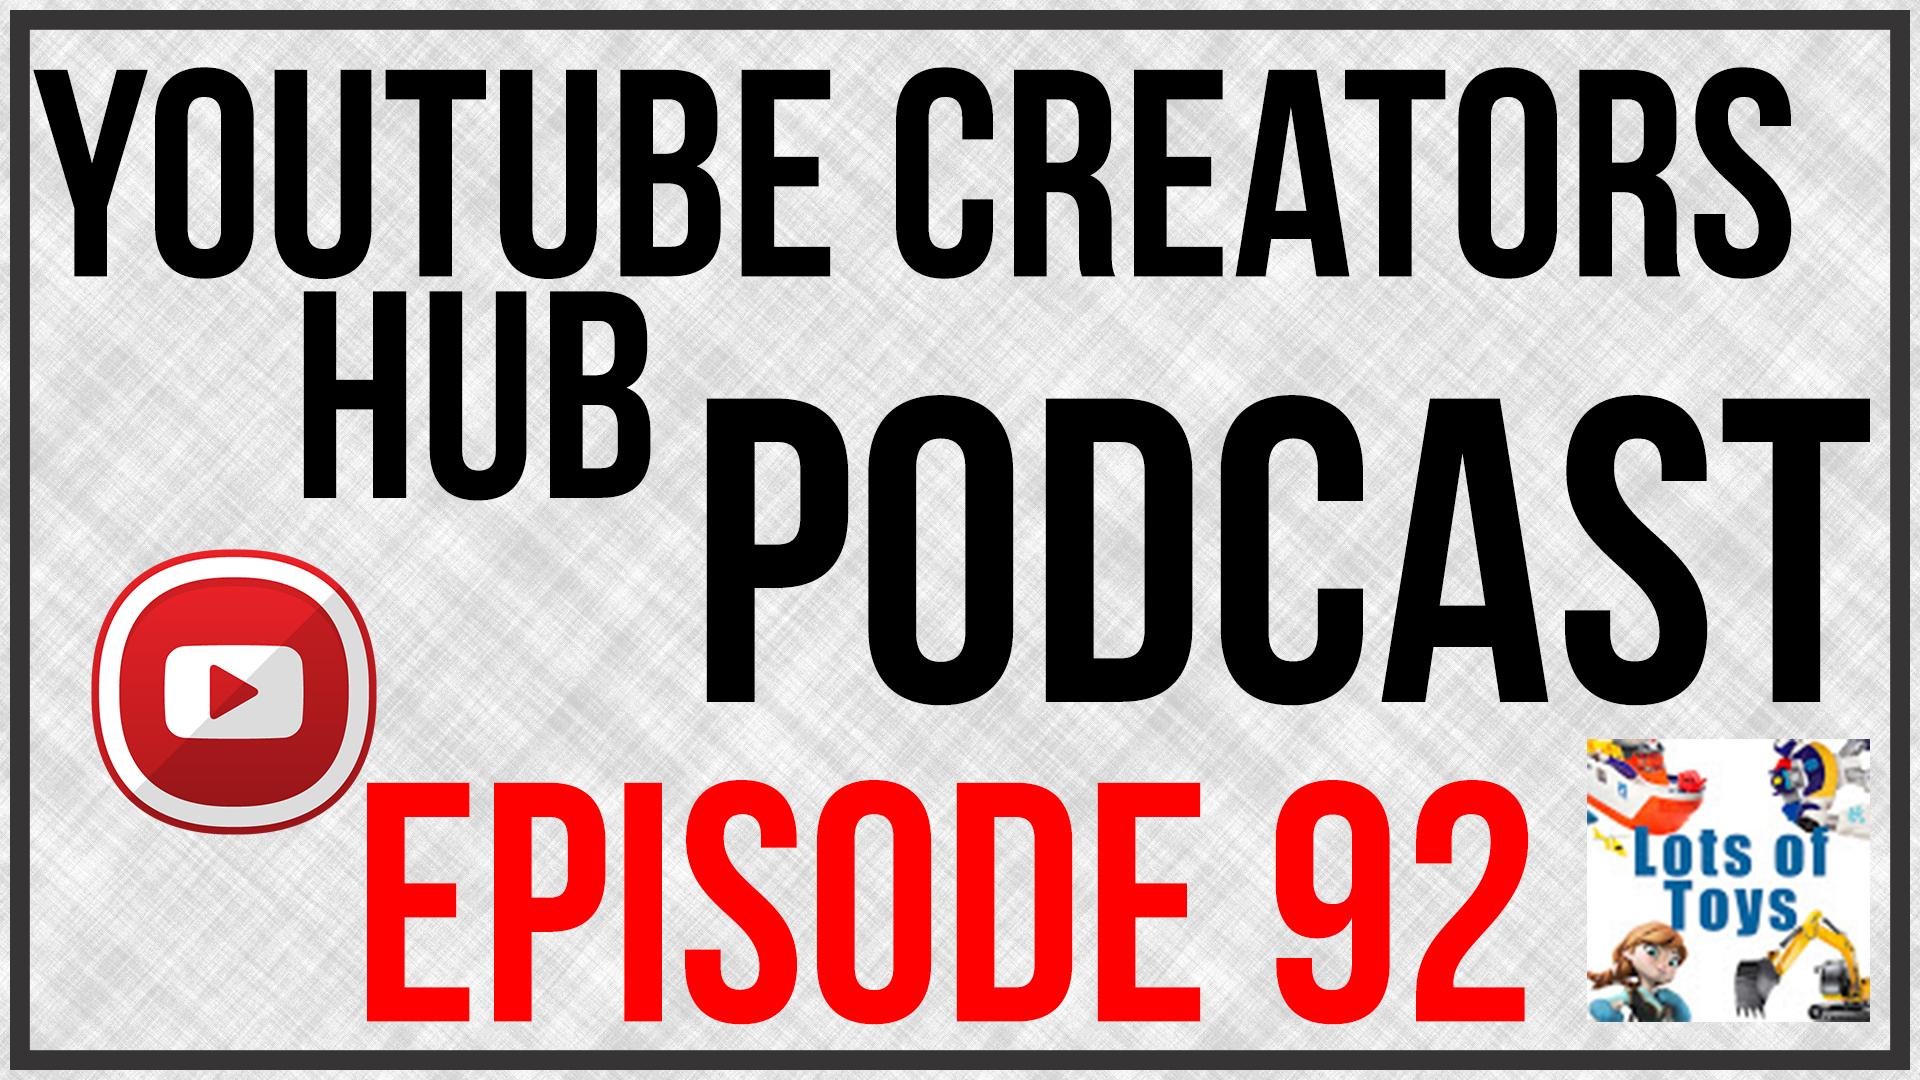 YouTube Creators Hub Podcast Episode 92